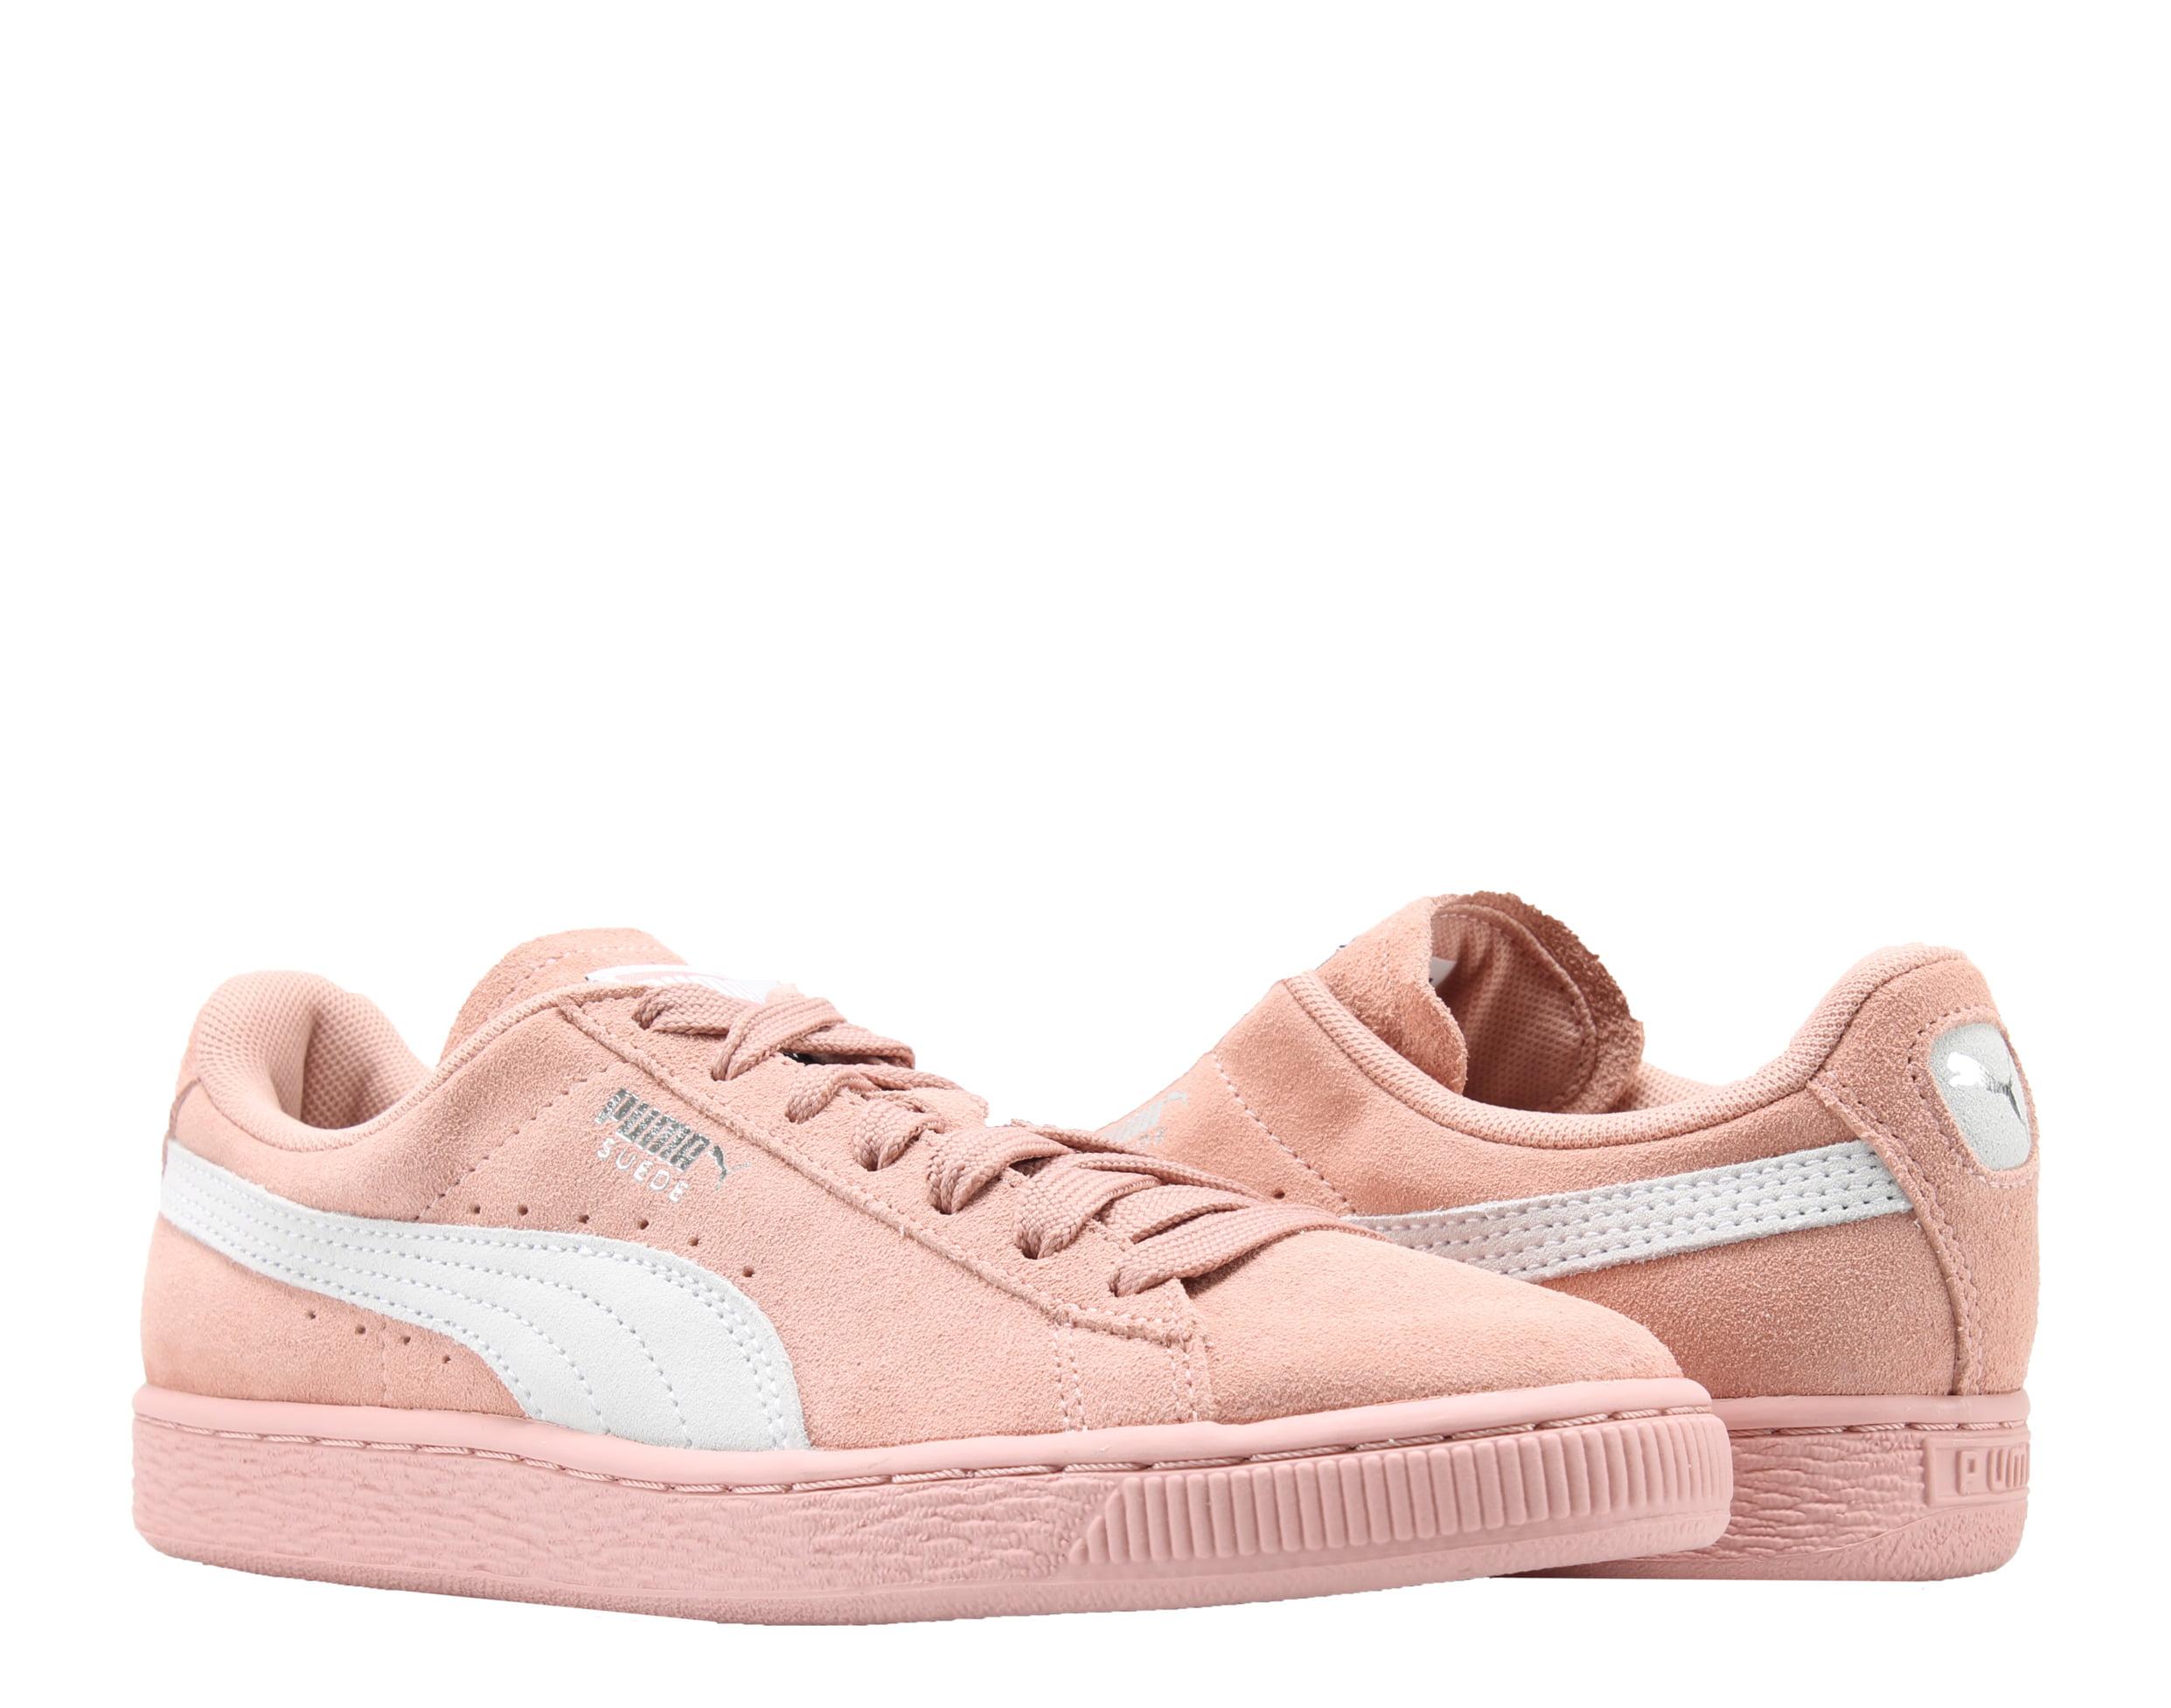 Puma Suede Classic Pink Peach Beige-White Women's Sneakers 35546267